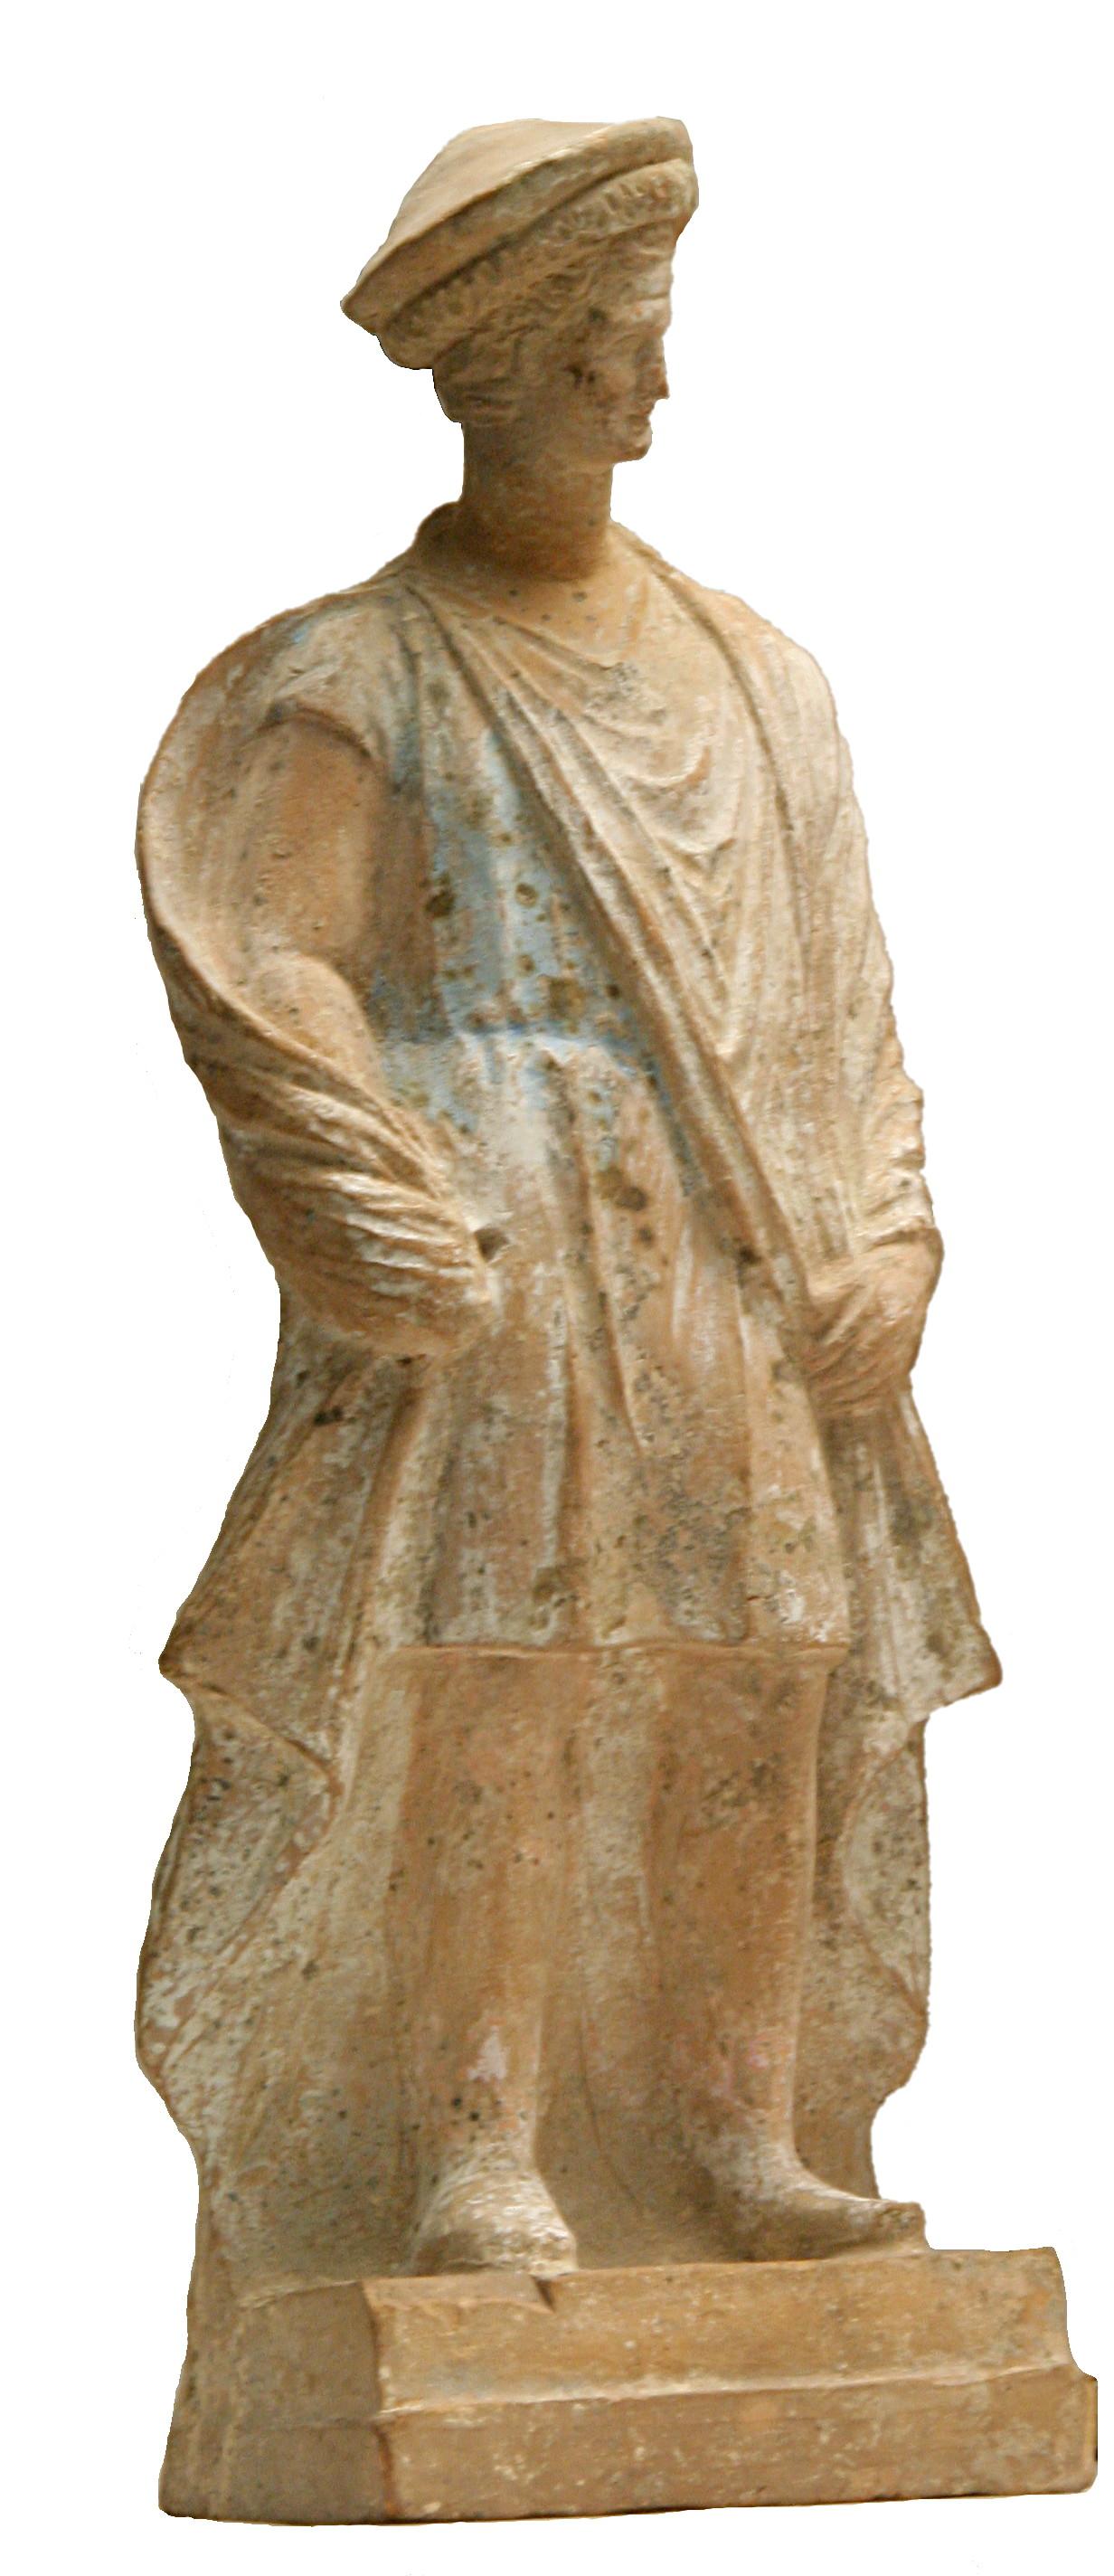 Terrakota_Statue_eines_Makedoniers_3_Jhd